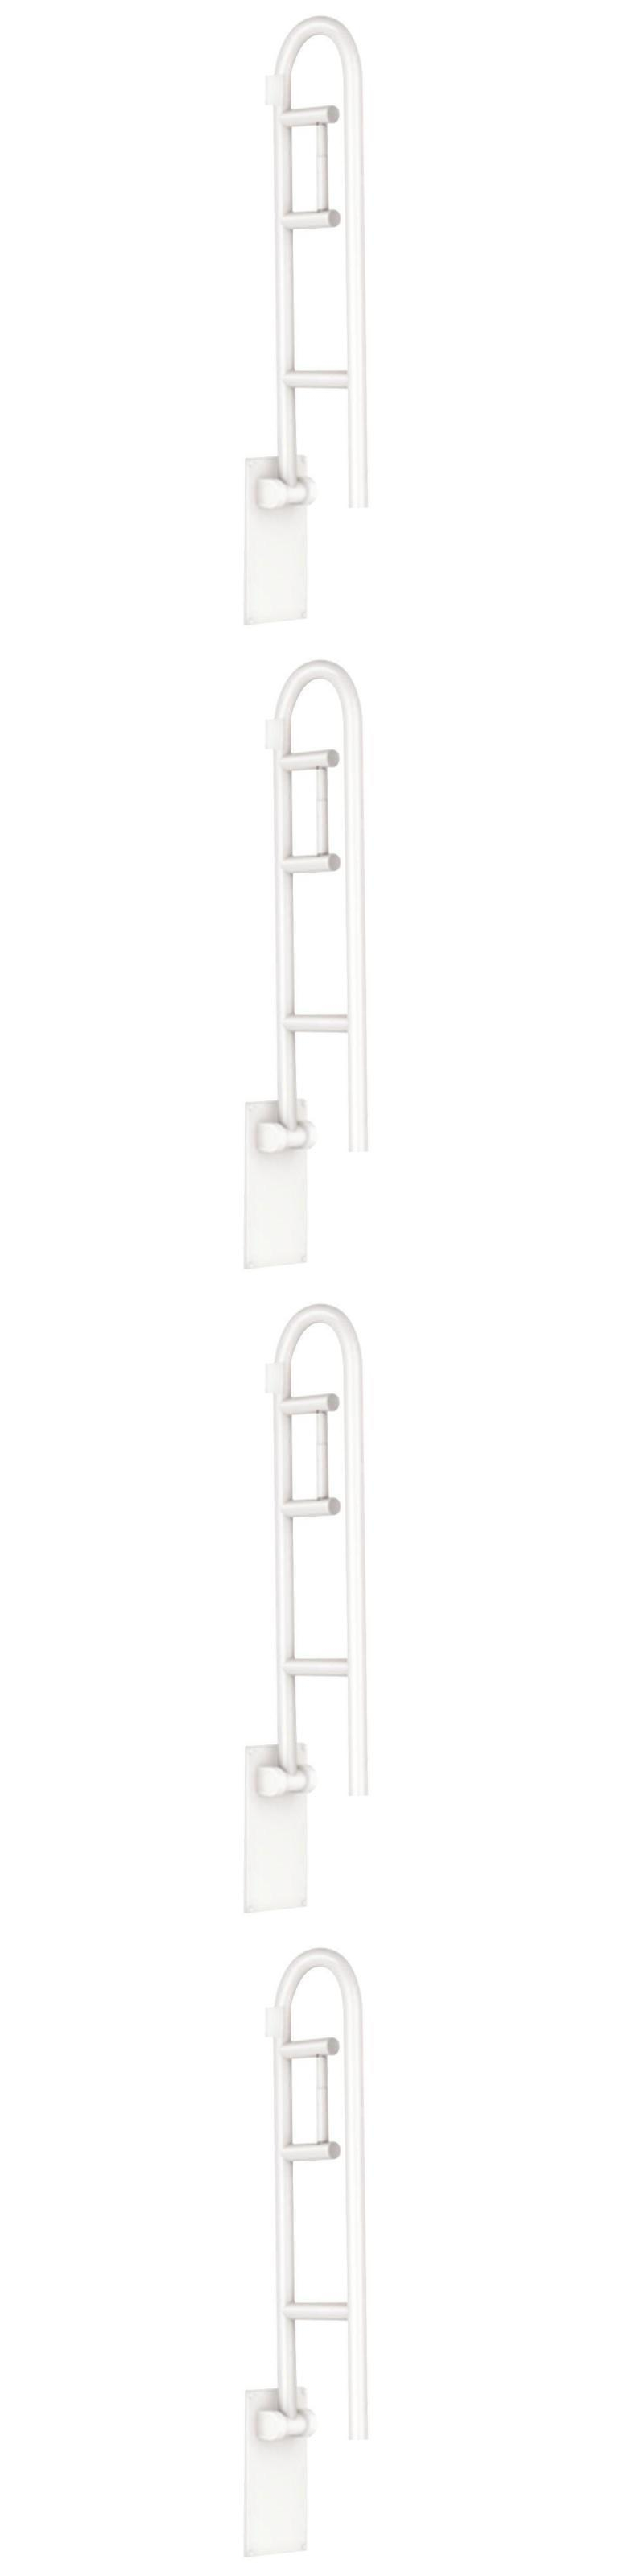 Handles and rails safety grab bar rail frame bathroom toilet